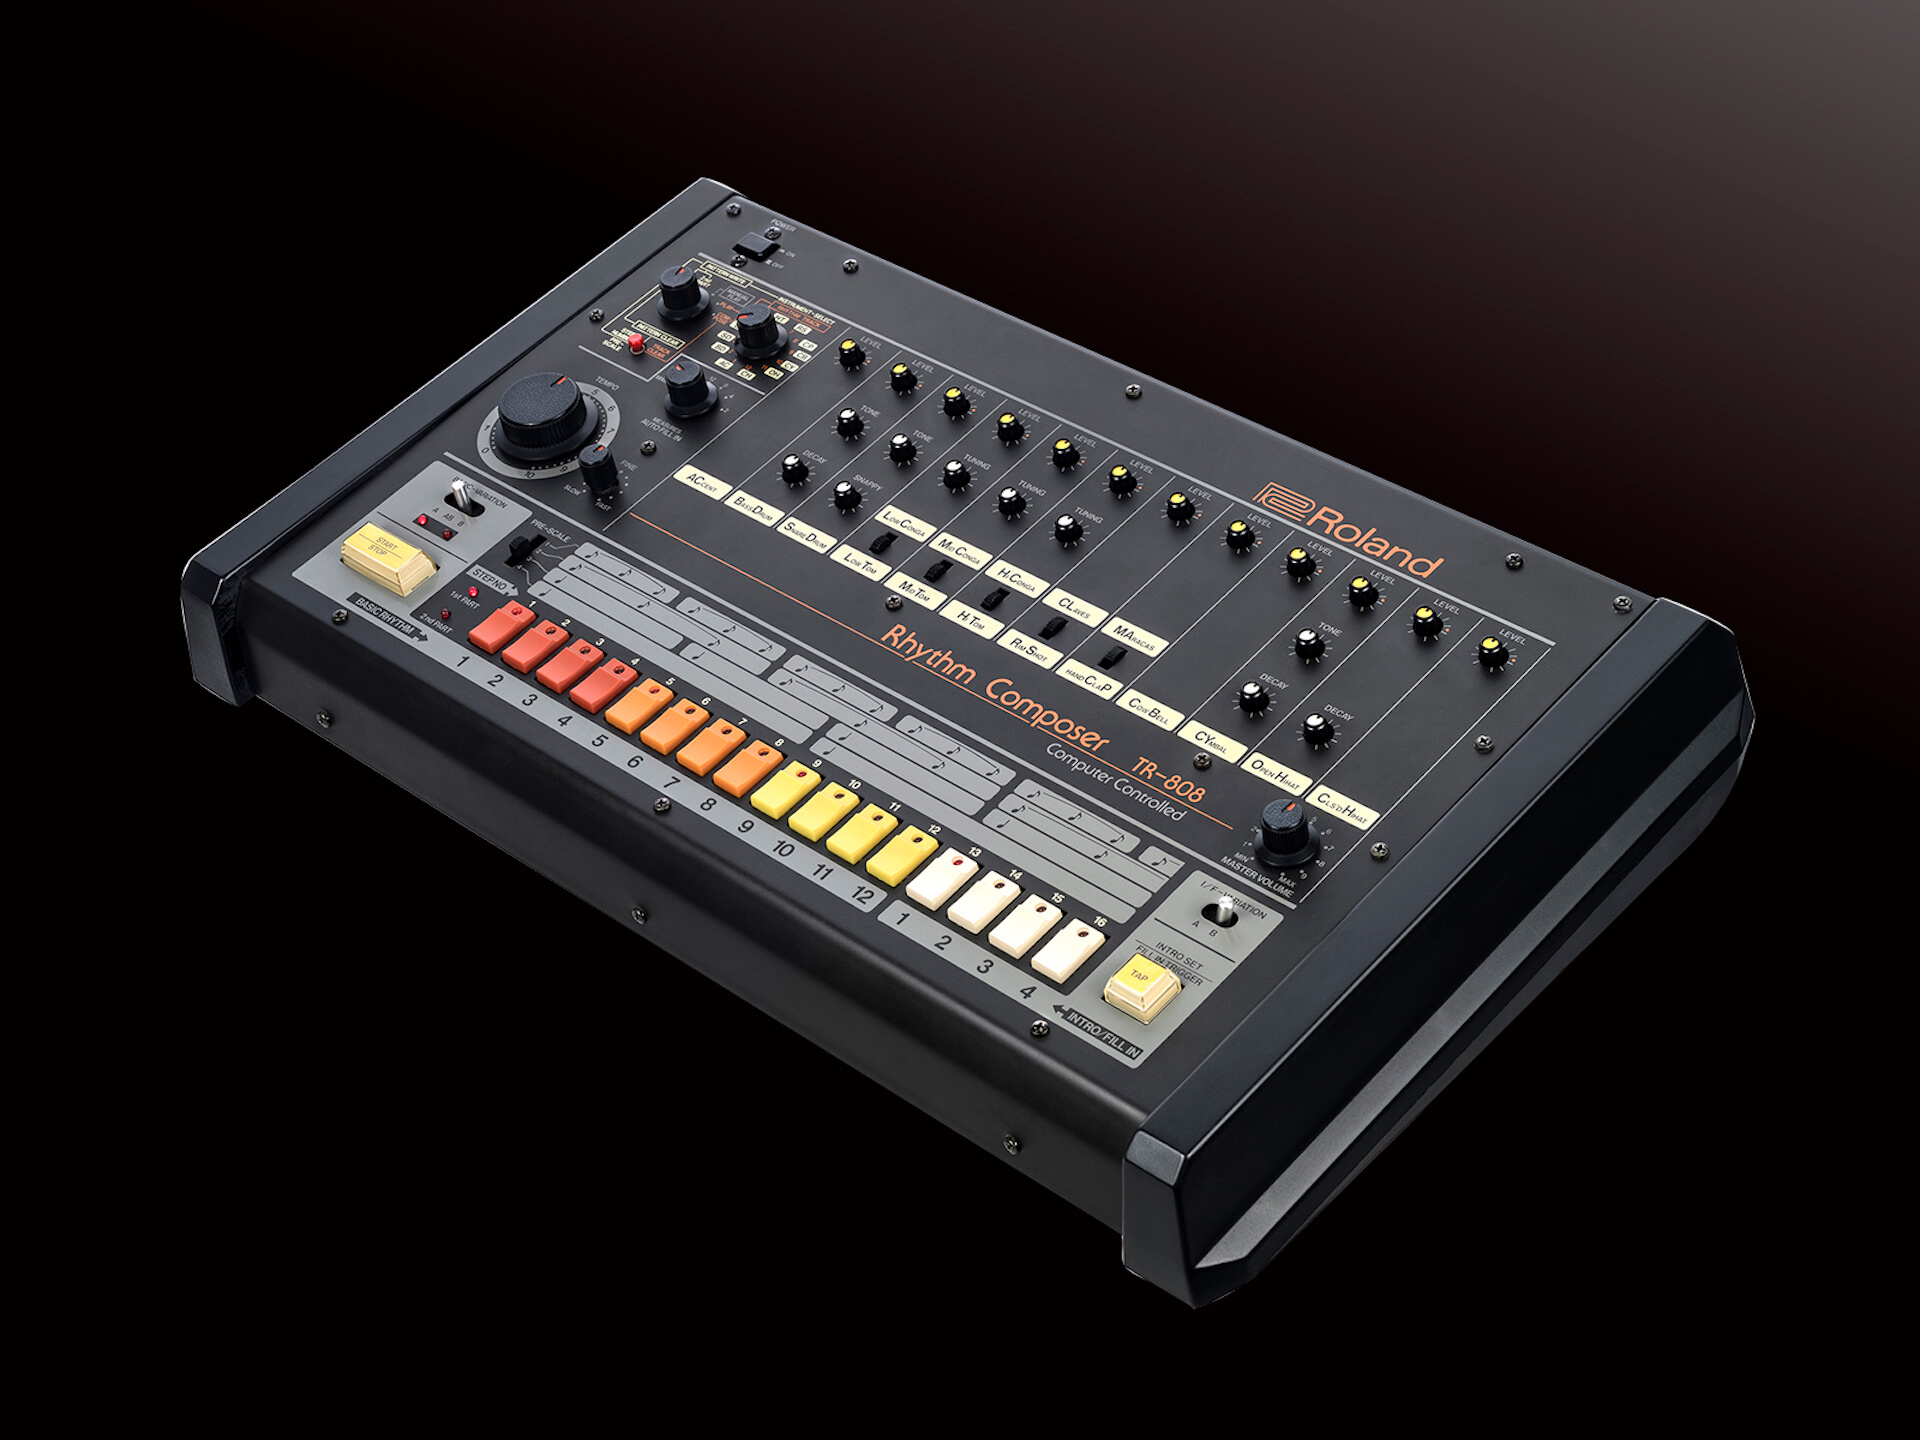 Rolandのリズムマシン『TR-808』が「重要科学技術史資料」に登録|電子楽器として史上初の快挙に art-culture190906-tr808-2